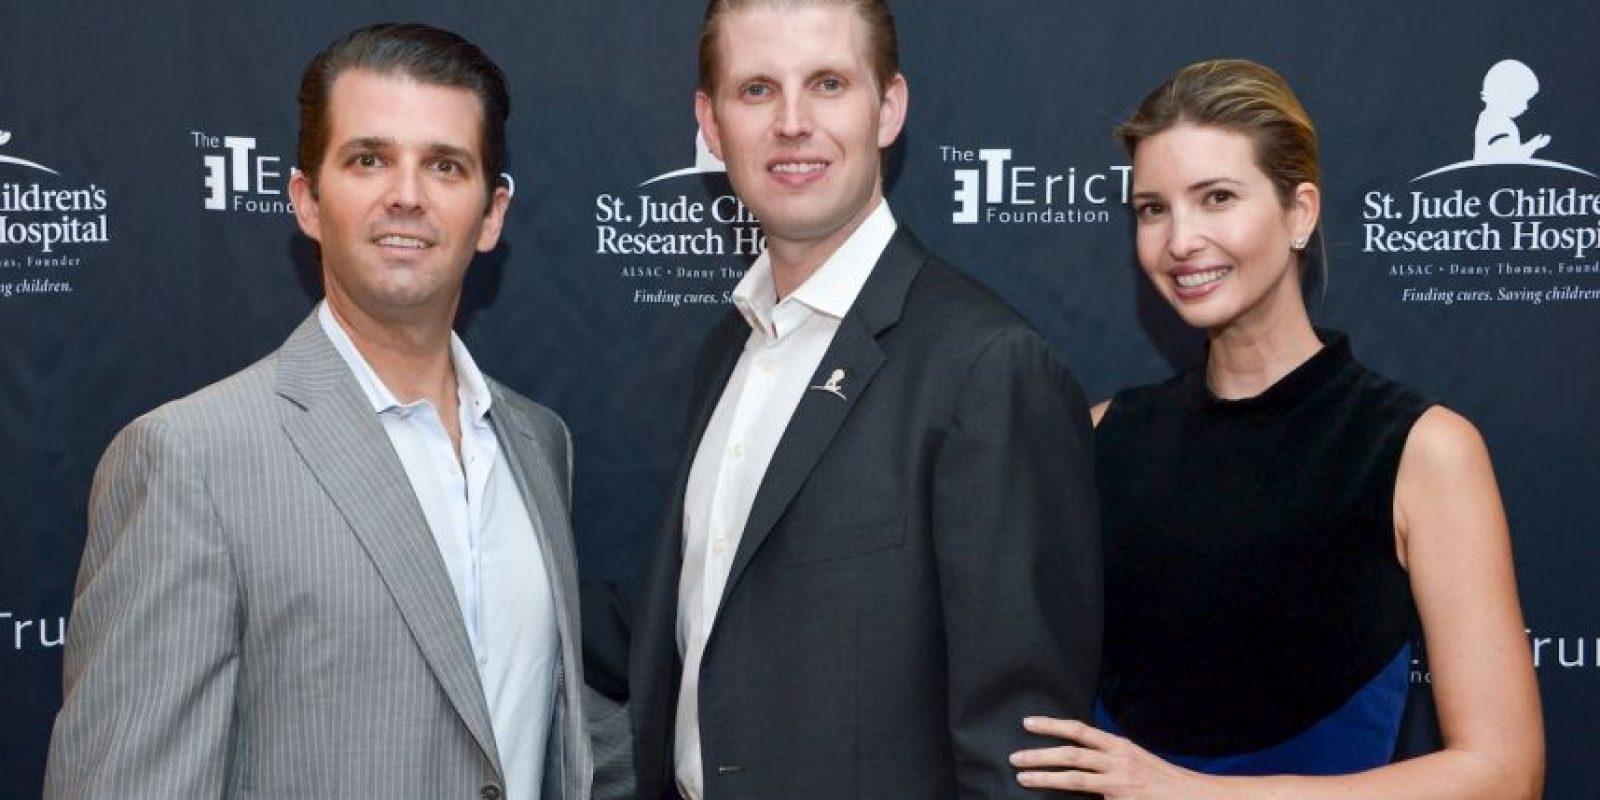 Con su primera esposa Ivana Trump tuvo a sus hijos Donald John Jr., Invanka Marie y Eric Fredrick. Foto:Getty Images